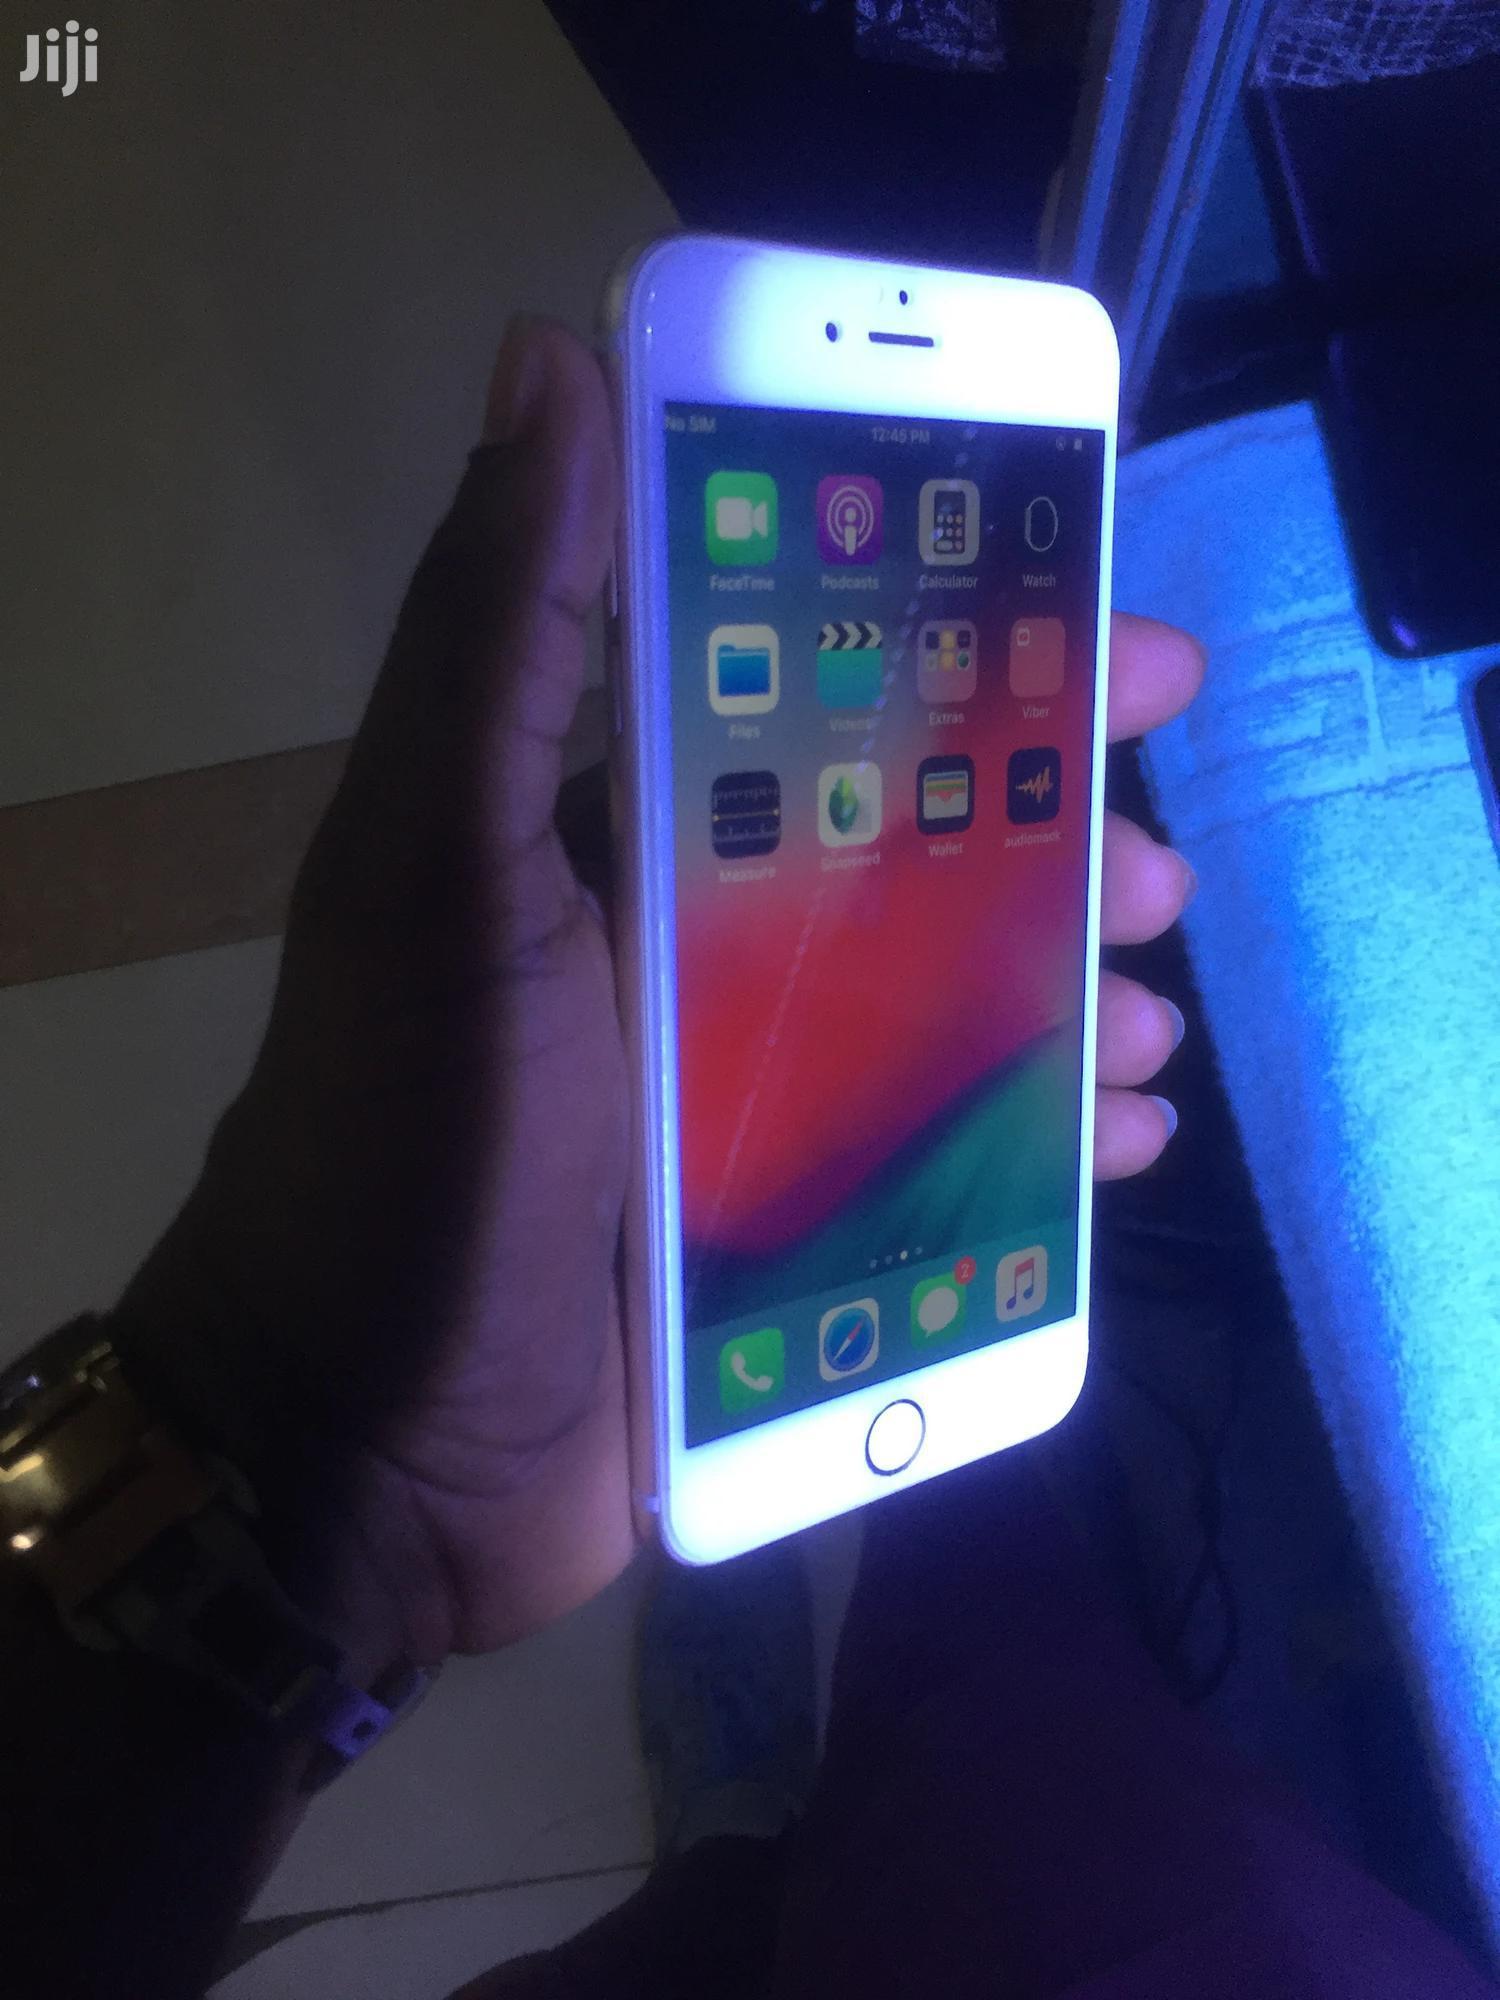 Apple iPhone 6s Plus 16 GB Gold | Mobile Phones for sale in Kampala, Central Region, Uganda